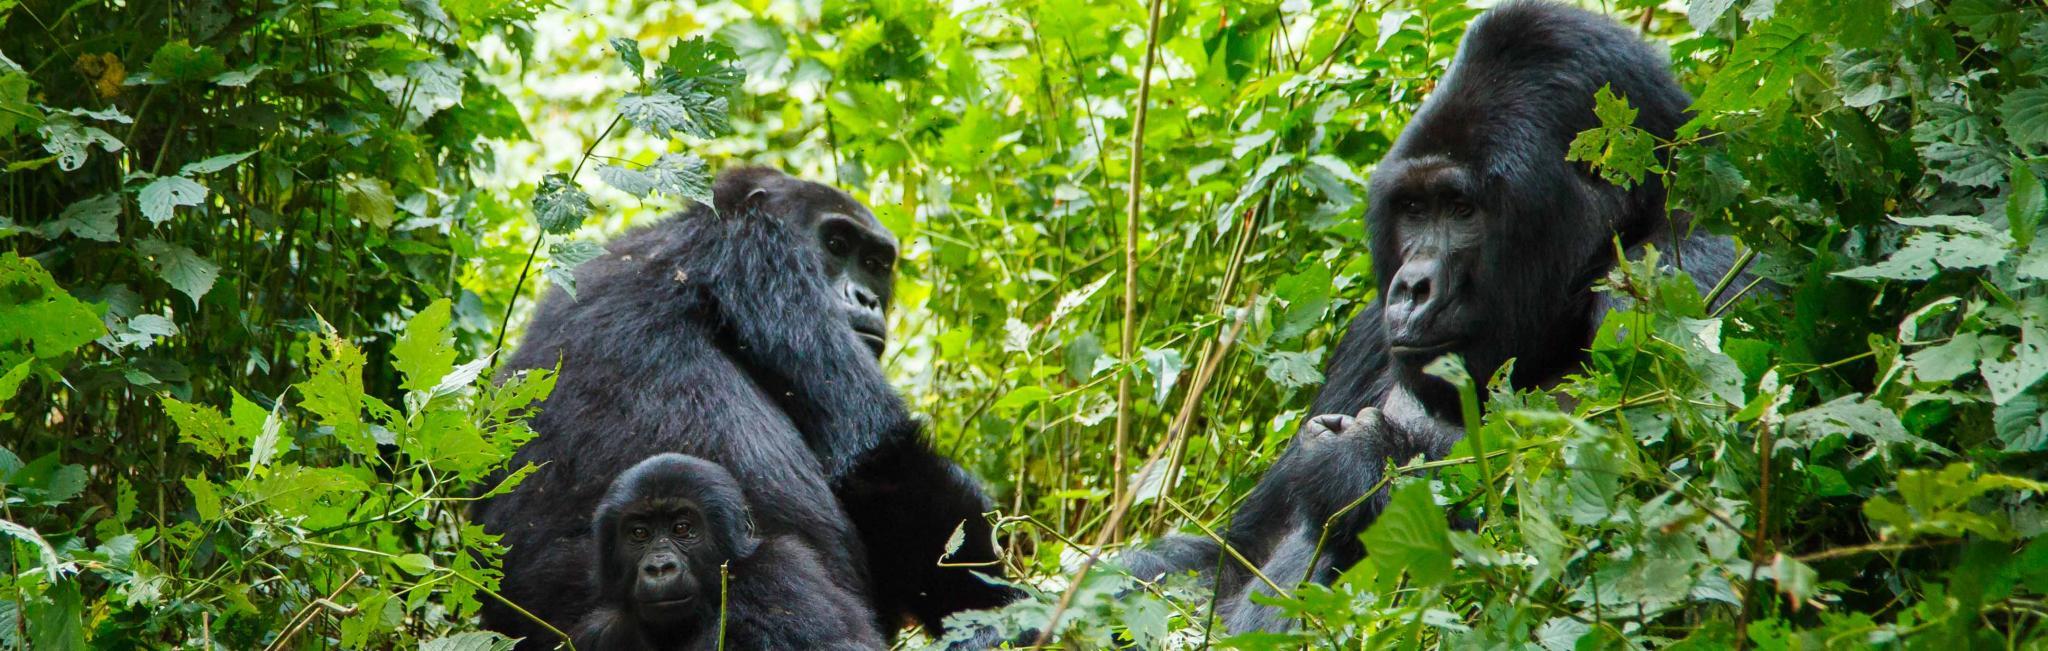 africa-rwanada-mountain-gorillas-in-trees.jpg